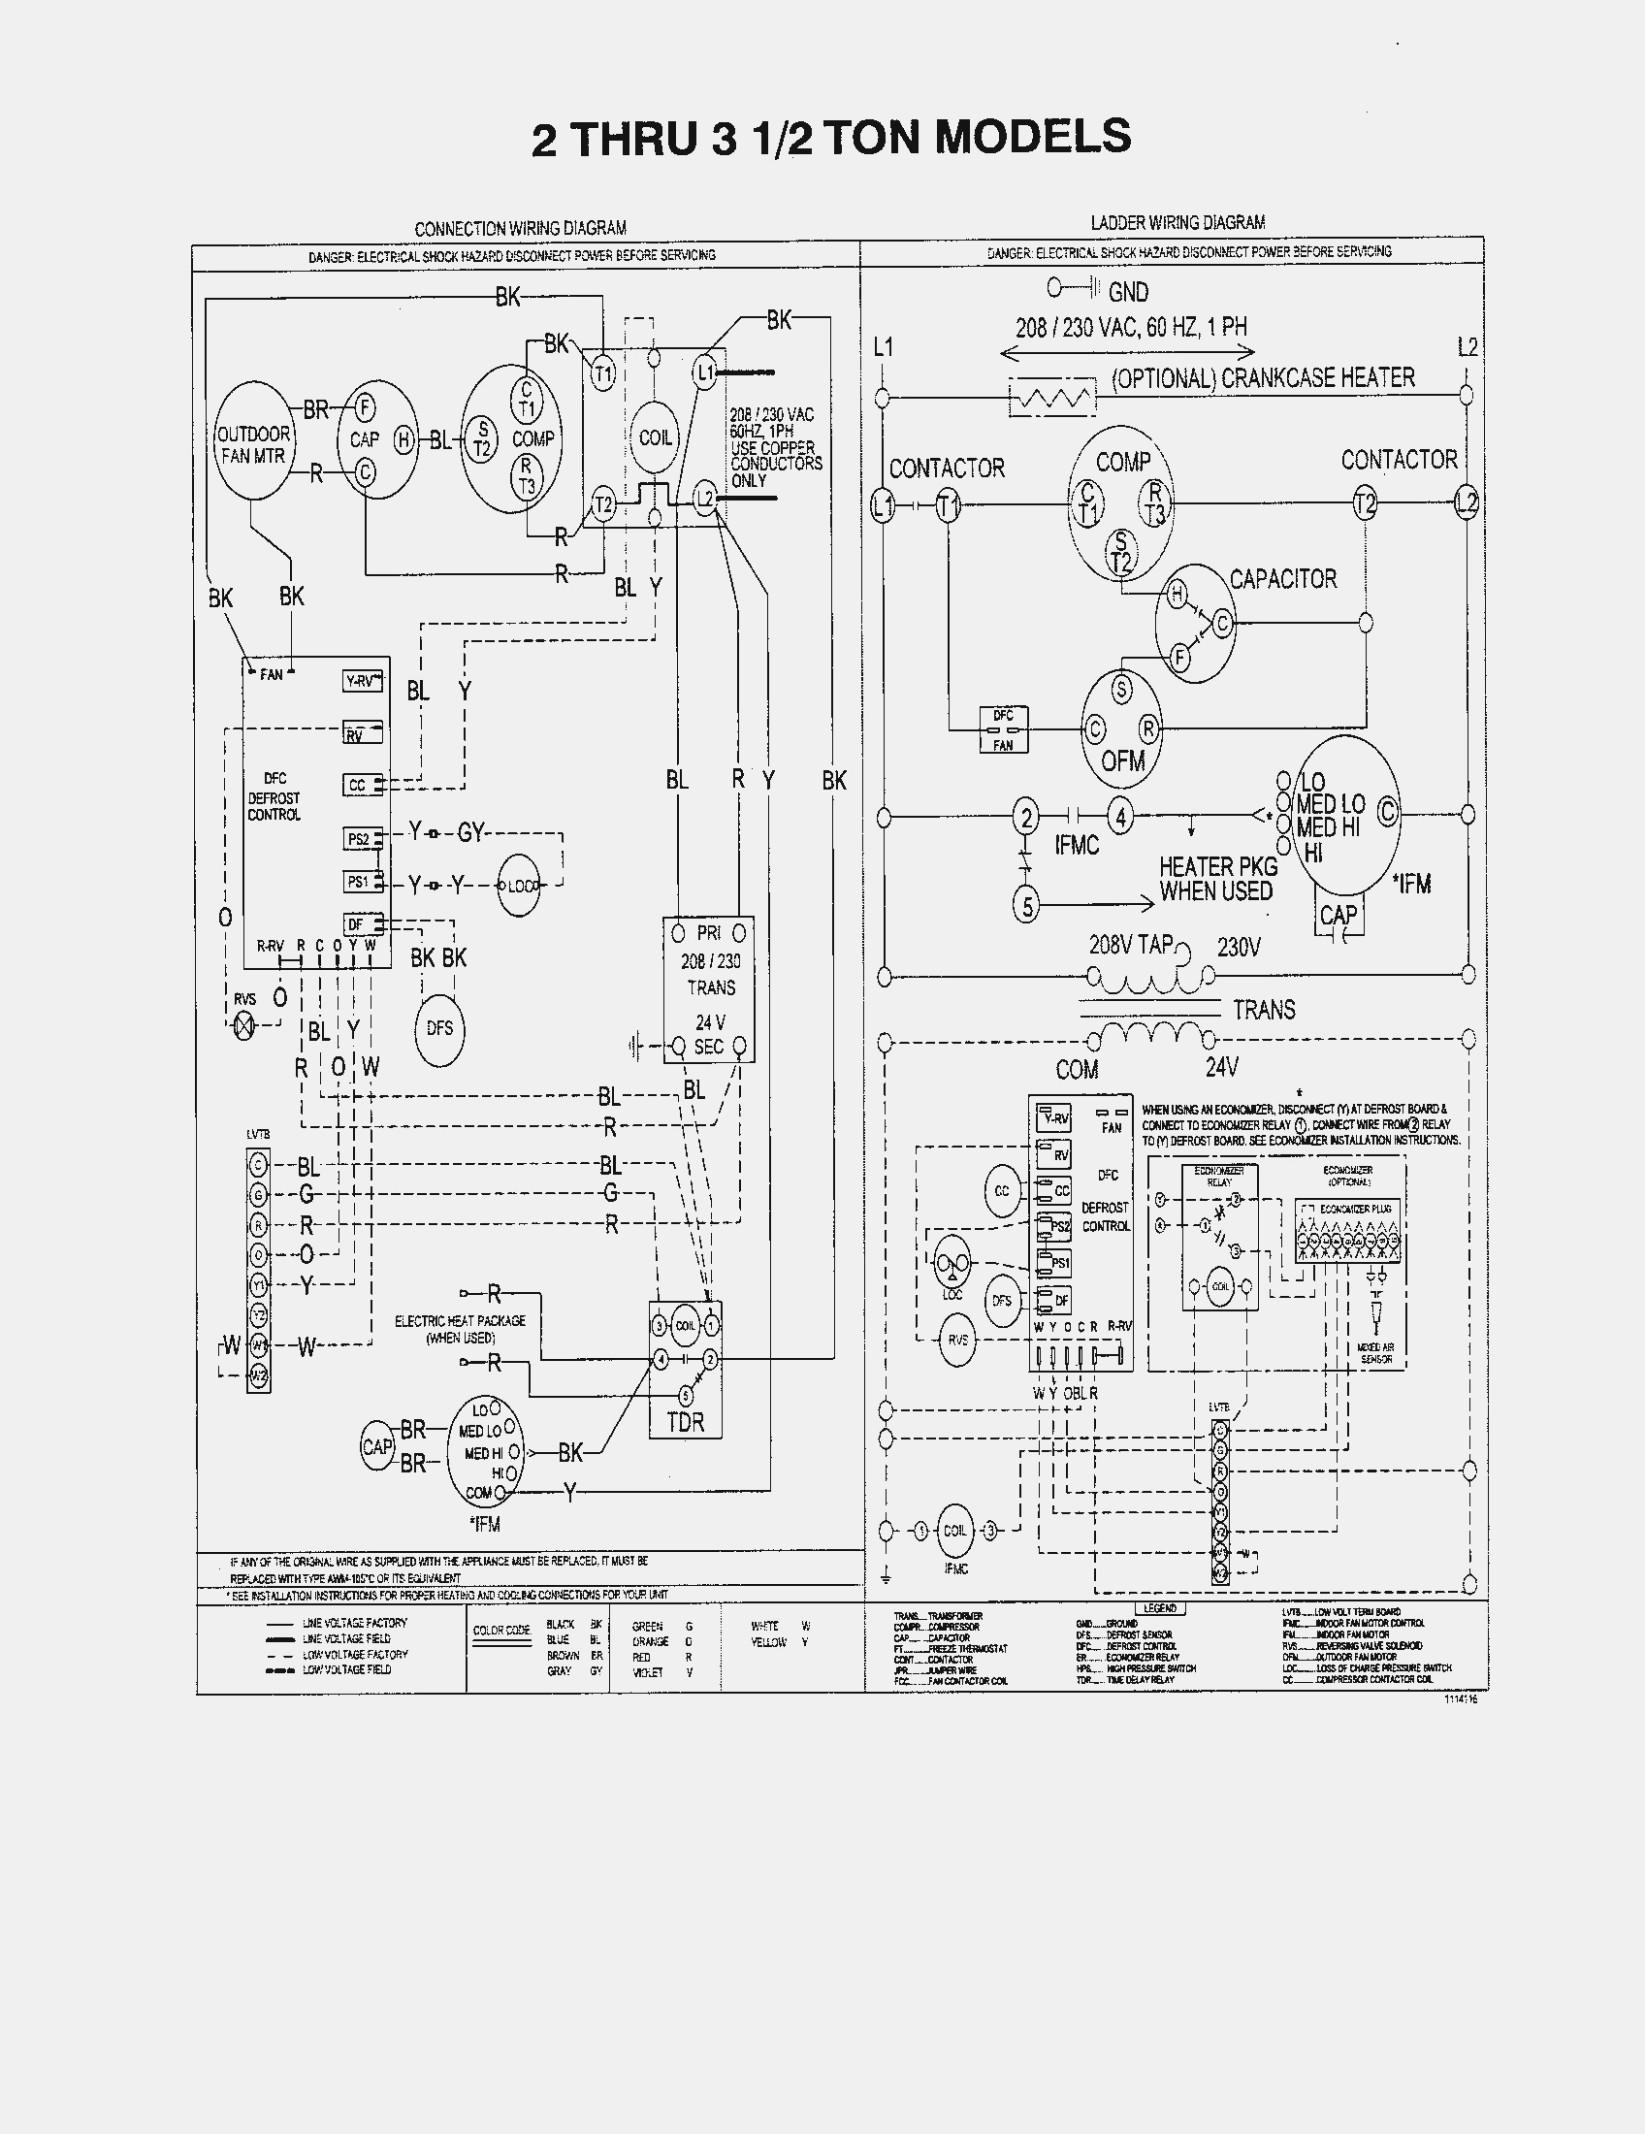 Amazing Heat York Diagram N Wiring Pump Ahc1606A Wiring Diagram Data Schema Wiring Cloud Ostrrenstrafr09Org